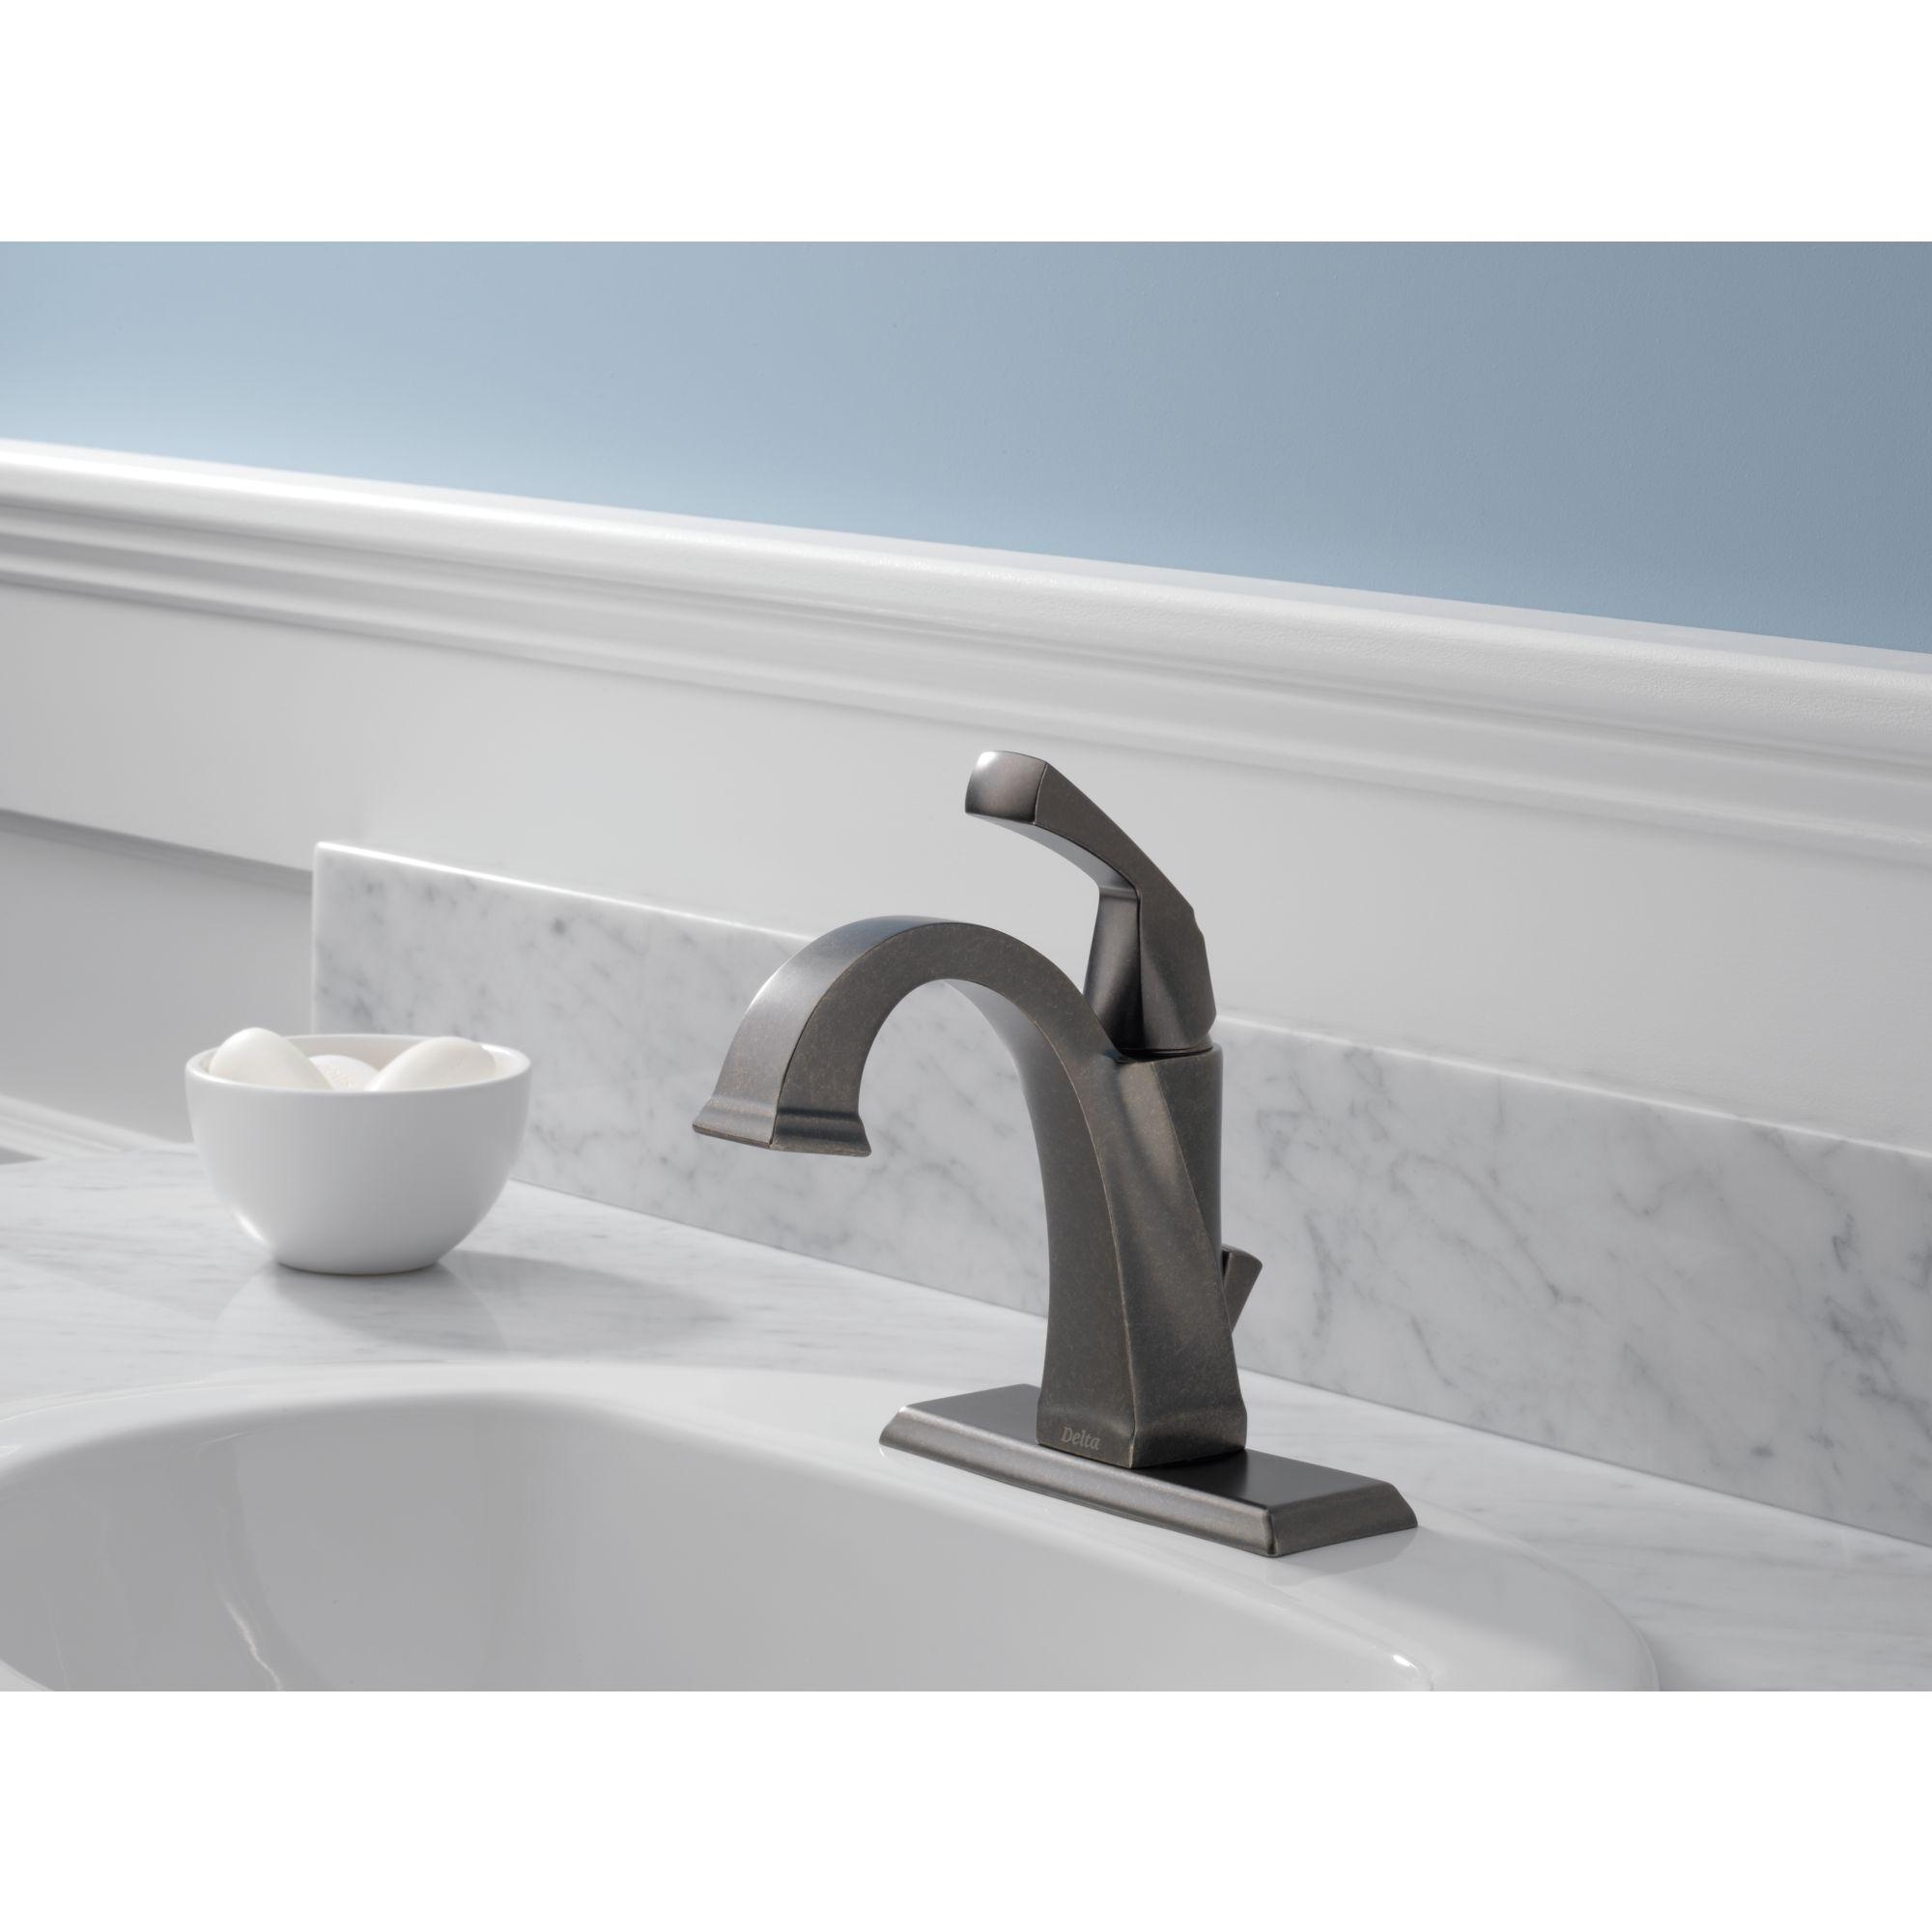 551 ss dst stainless steel delta dryden single handle centerset bathroom faucet w pop up drain